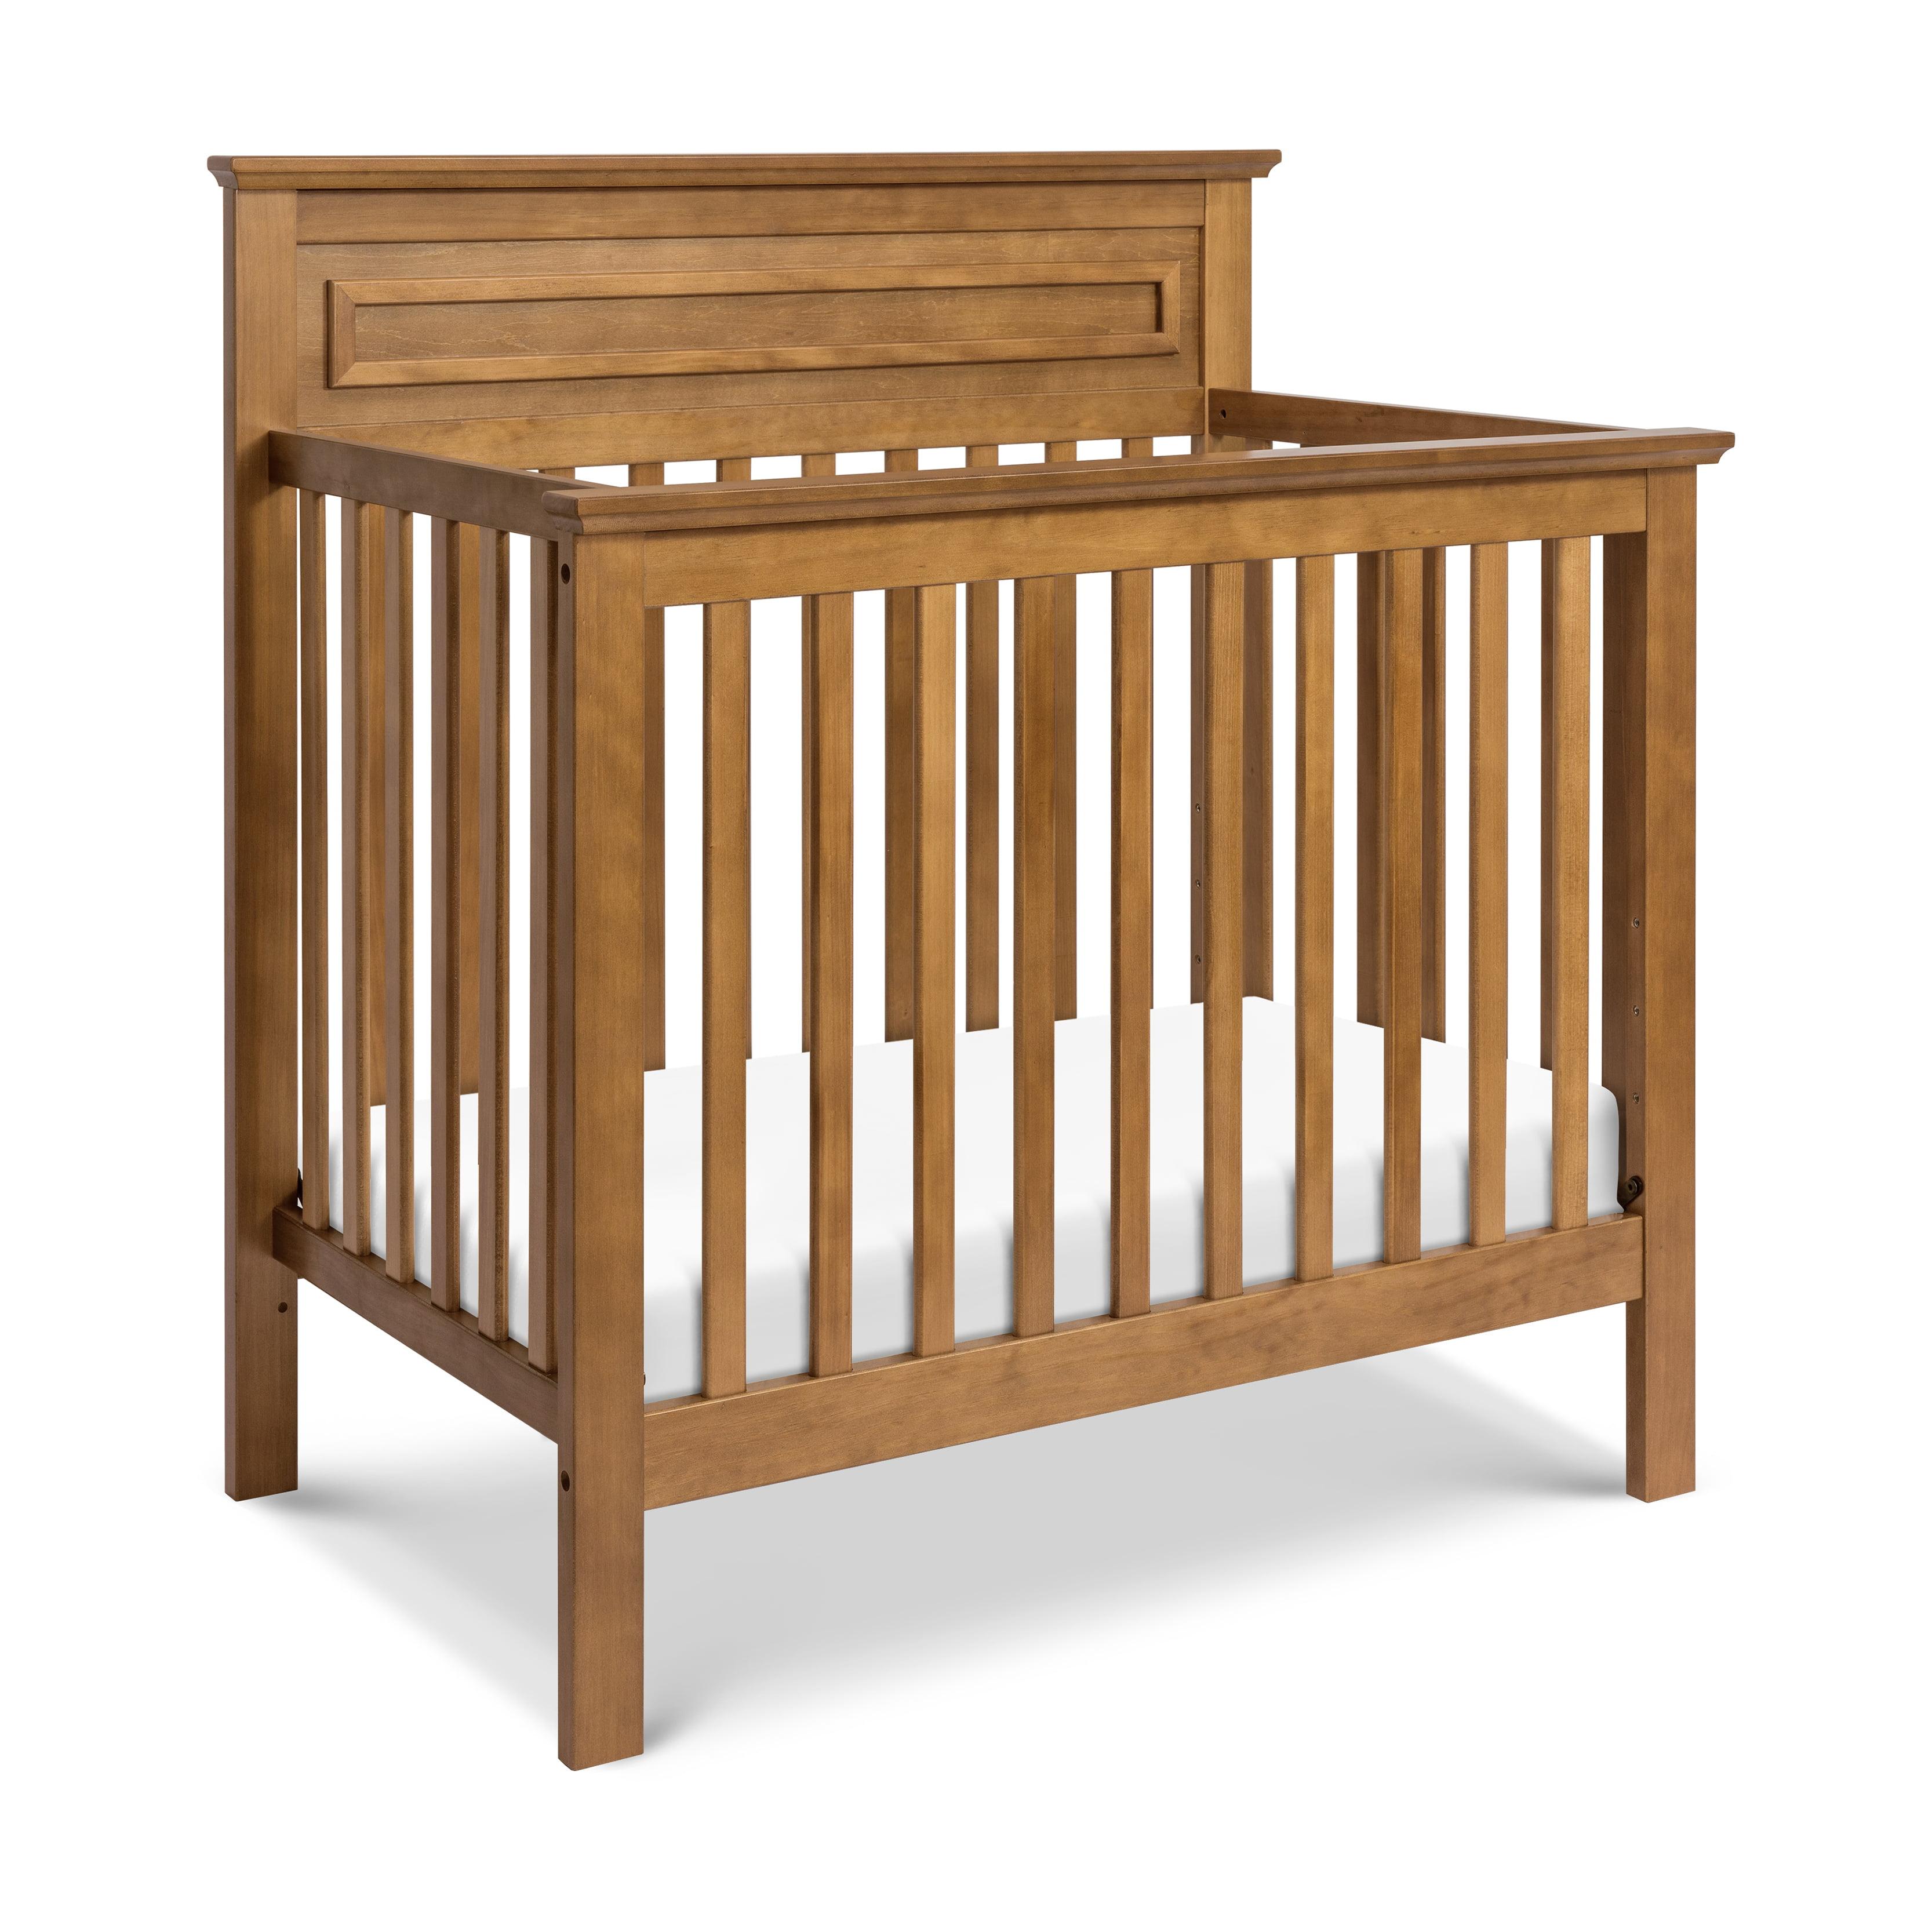 DaVinci Autumn 2-in-1 Mini Crib and Twin Bed in Chestnut